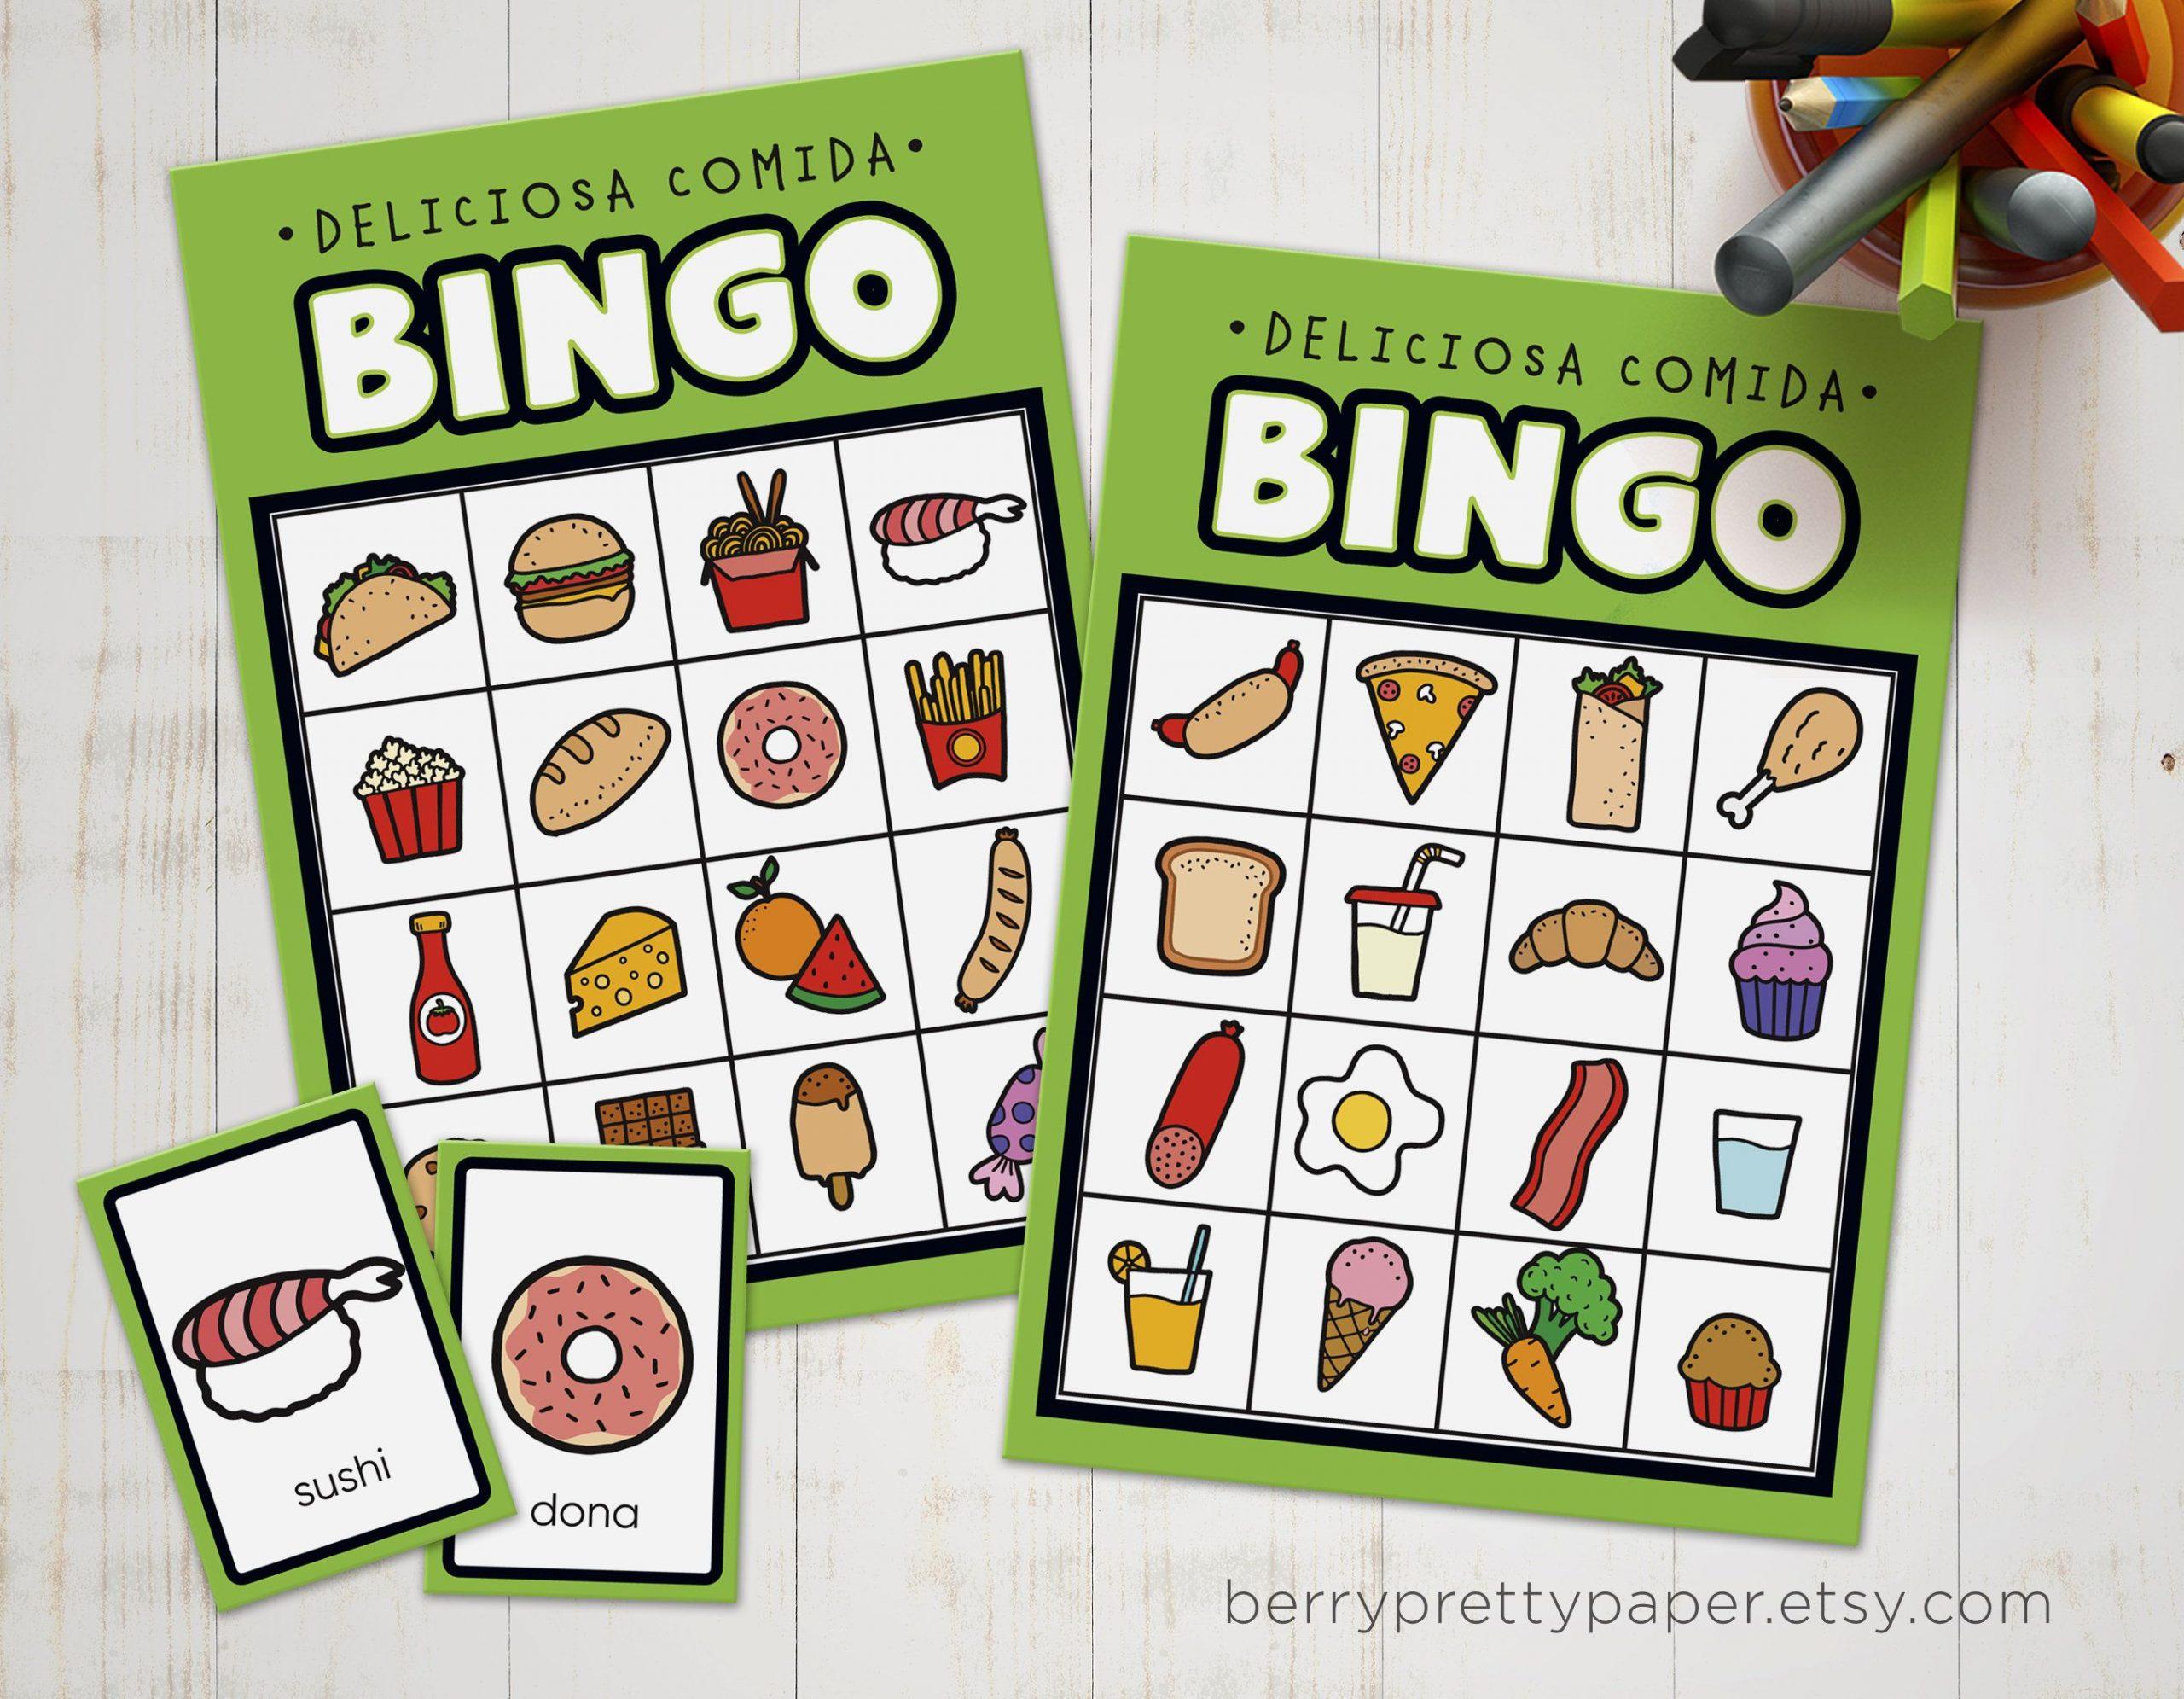 Bingo In Spanish For Kids Food Version - Bingo Game To Learn